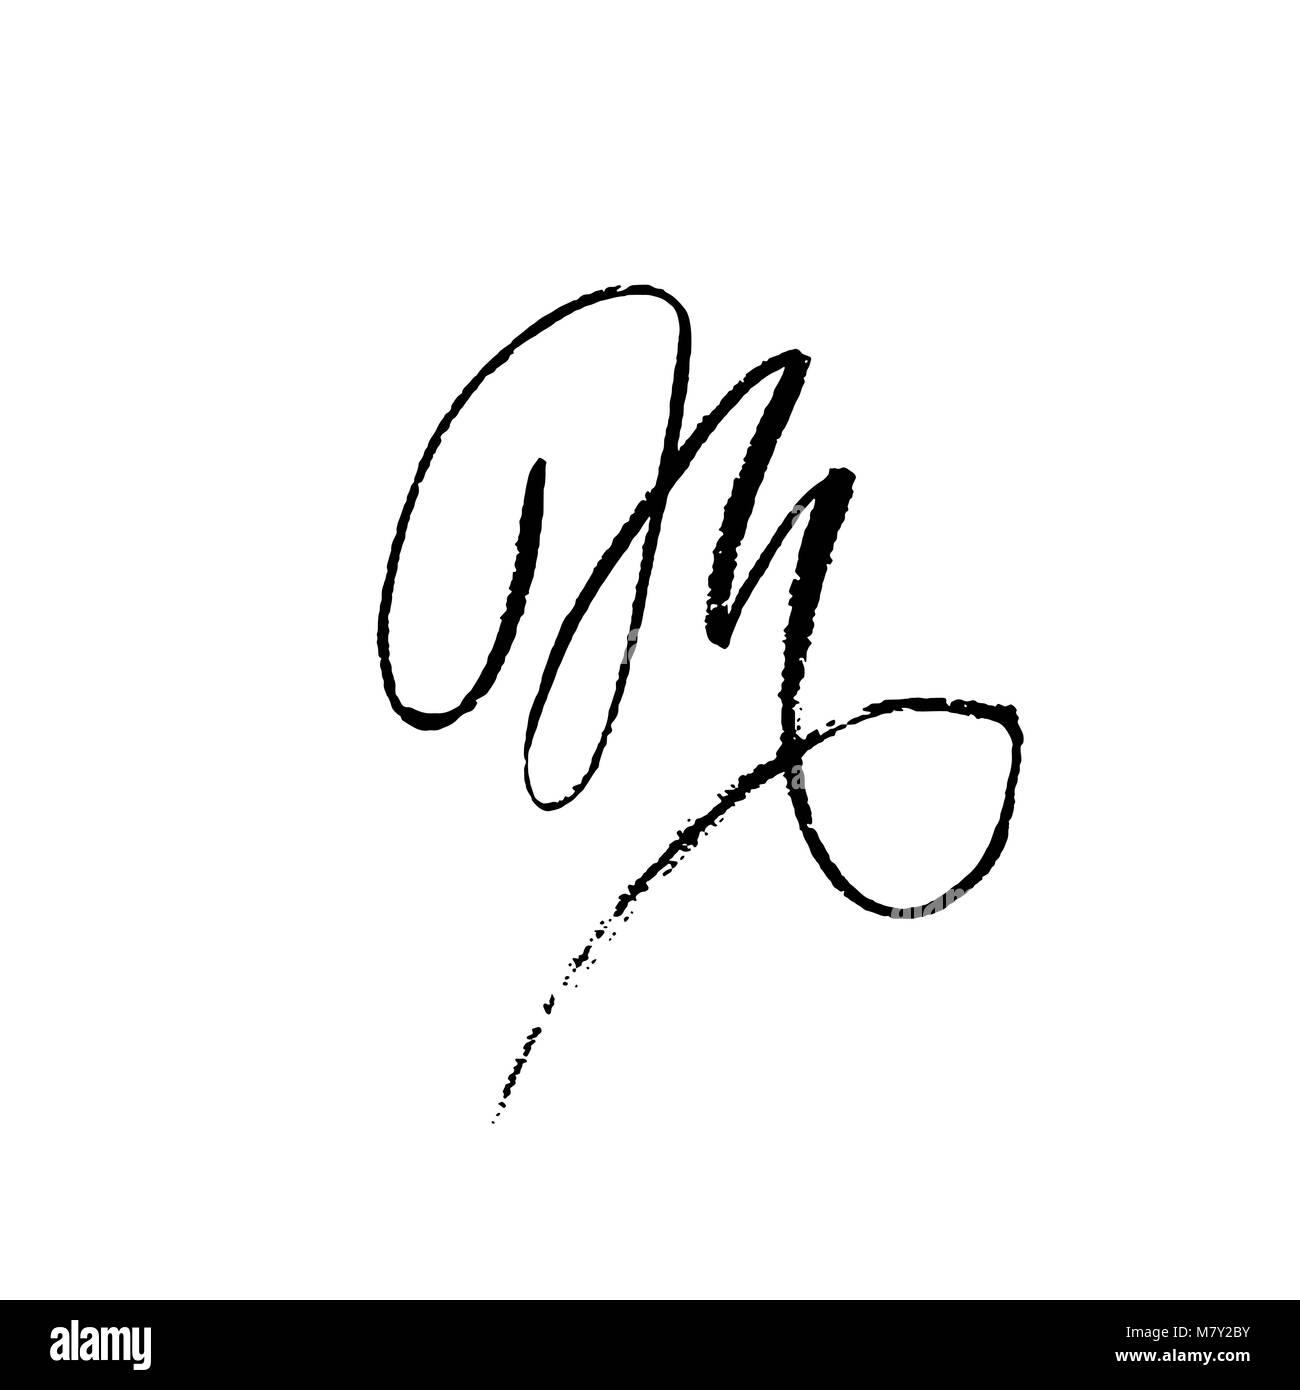 Letter M Handwritten By Dry Brush Rough Strokes Textured Font Vector Illustration Grunge Style Elegant Alphabet